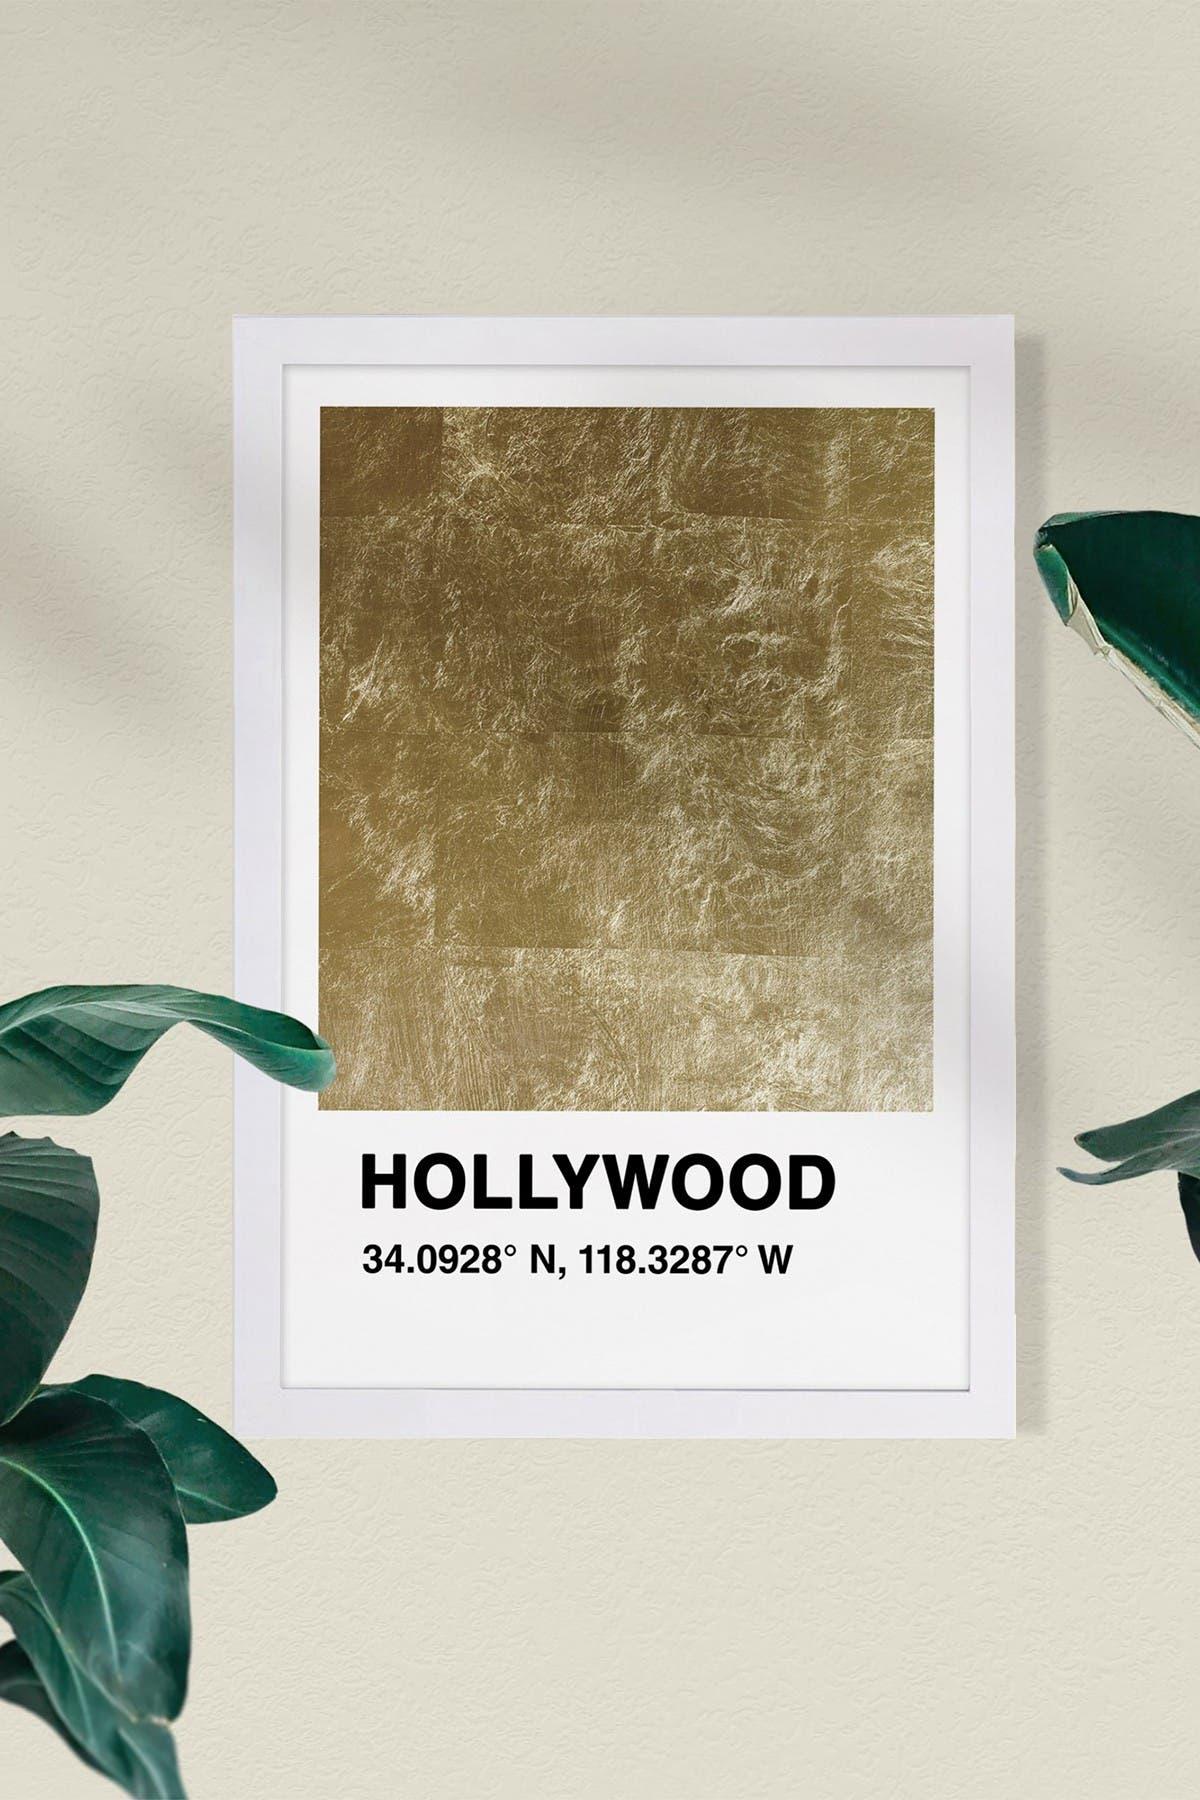 Image of Wynwood Studio Hollywood Color Swatch Art